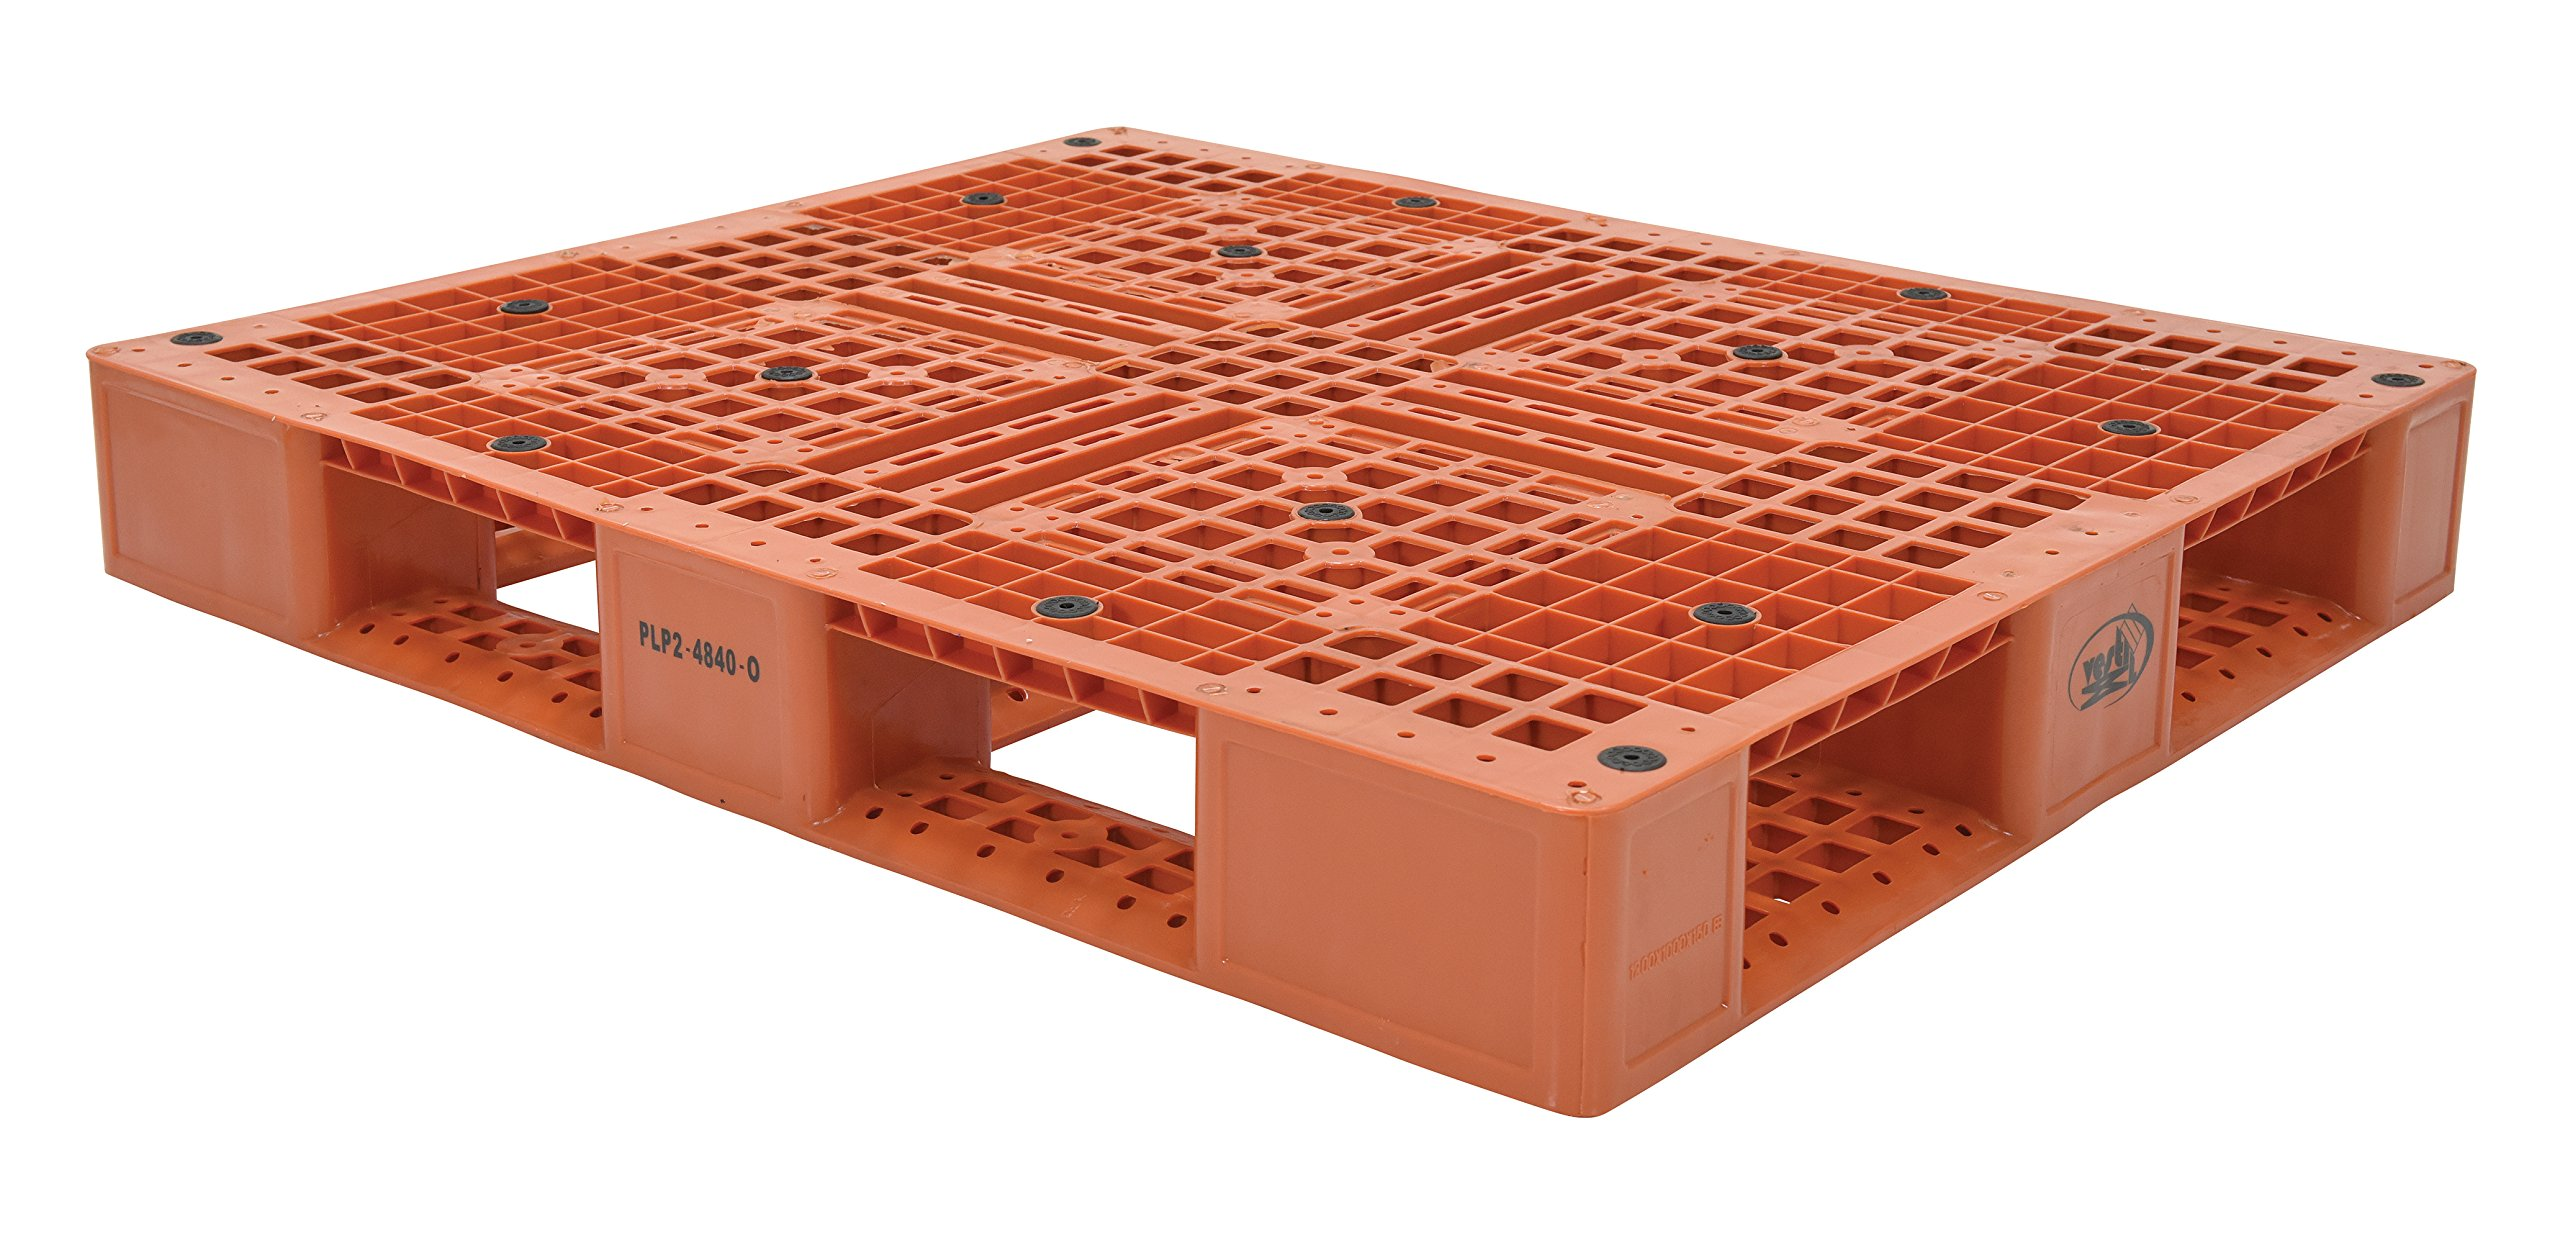 Vestil PLP2-4840-ORANGE Polyethylene Pallet with 4 Way Entry, 6600 lbs Capacity, 39.5'' Length, 47.375'' Width, 6'' Height